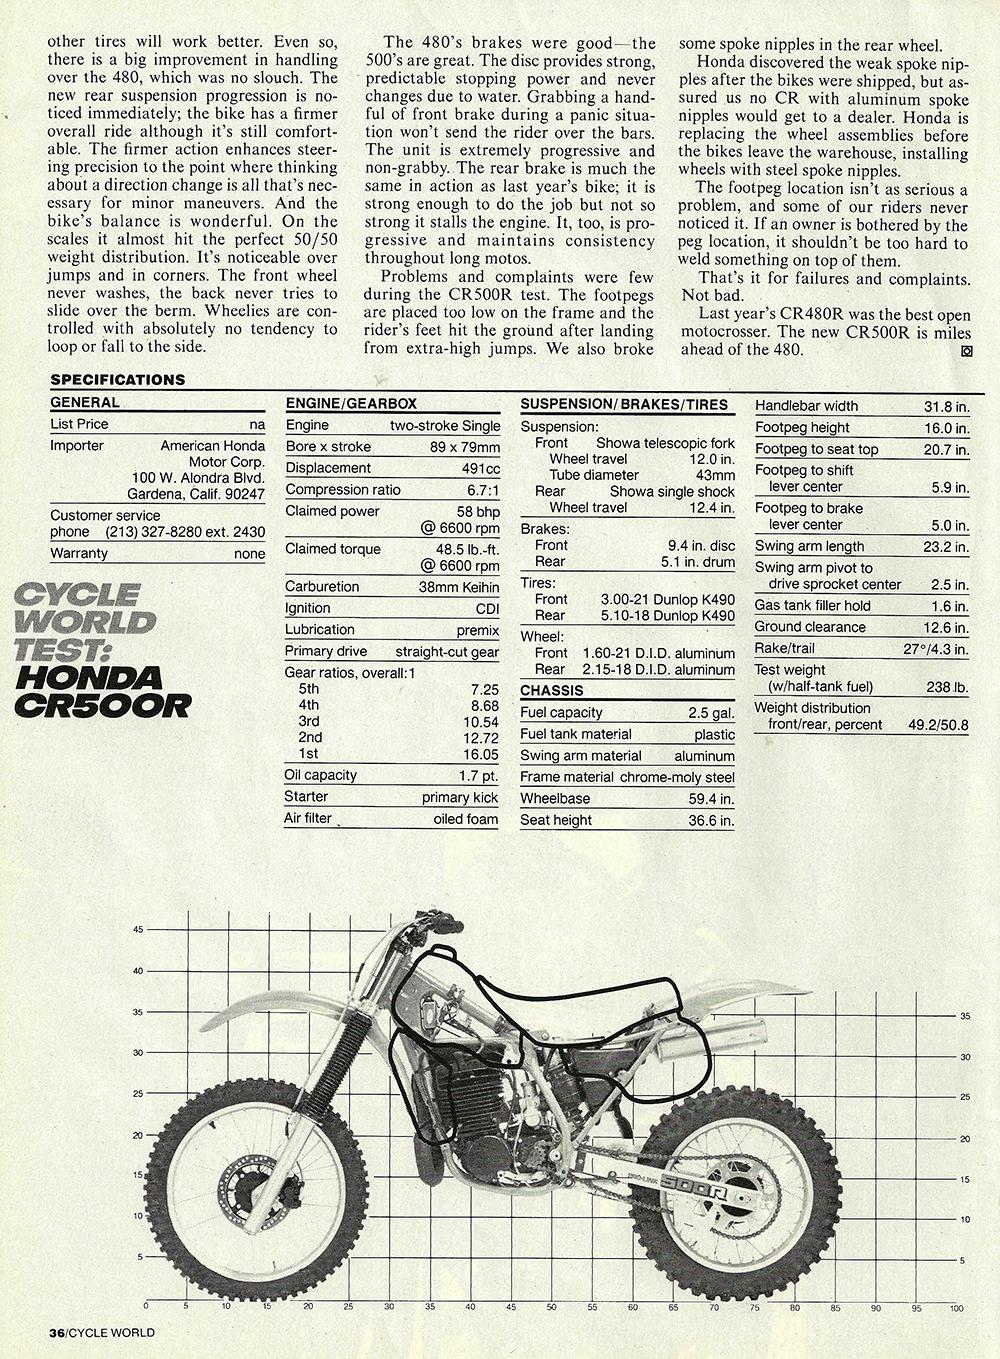 1983 Honda CR500R road test 05.jpg